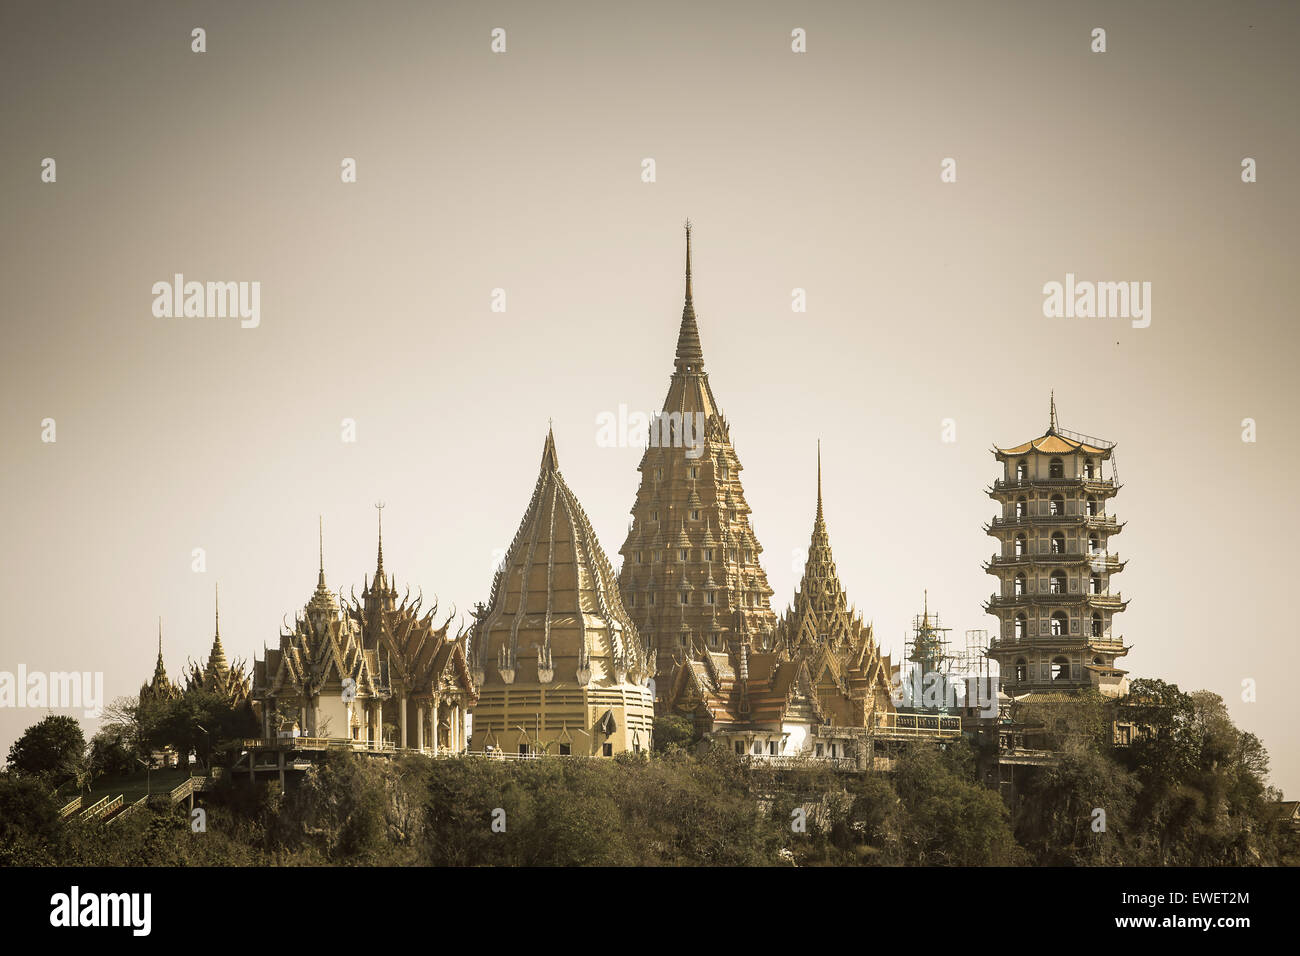 Retro stylized photo of Wat Tham Sua(Tiger Cave Temple), Tha Moung, Kanchanburi, Thailand - Stock Image